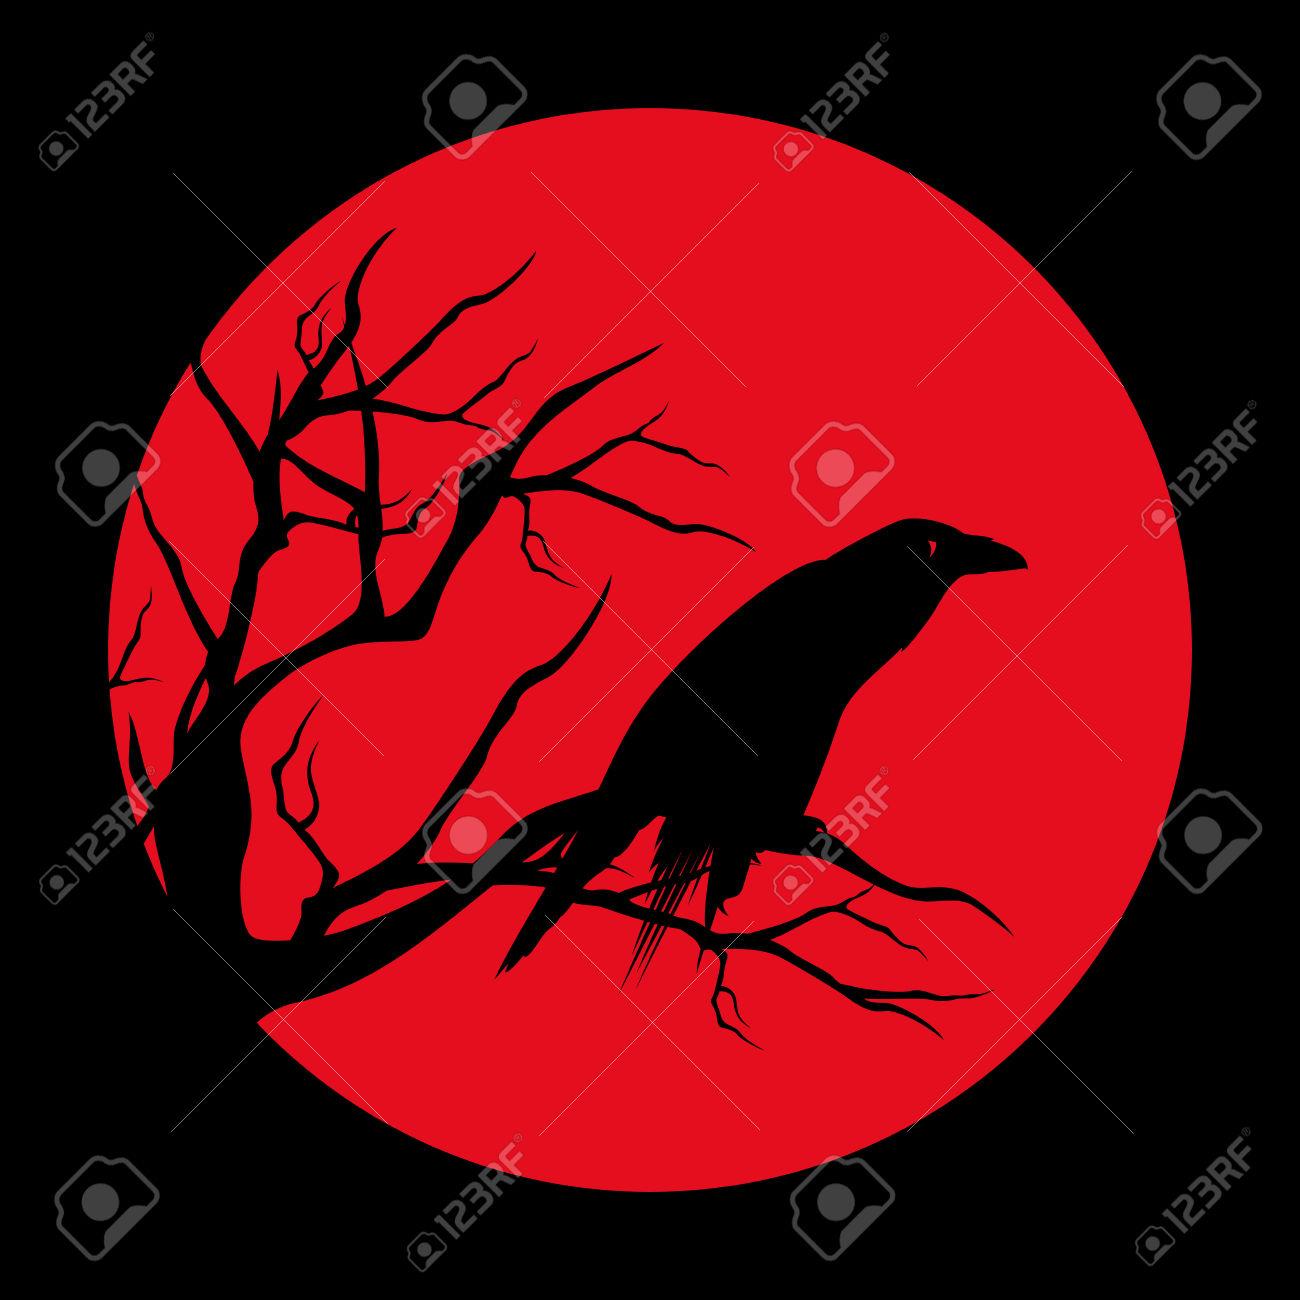 Raven Bird Ominous Design.